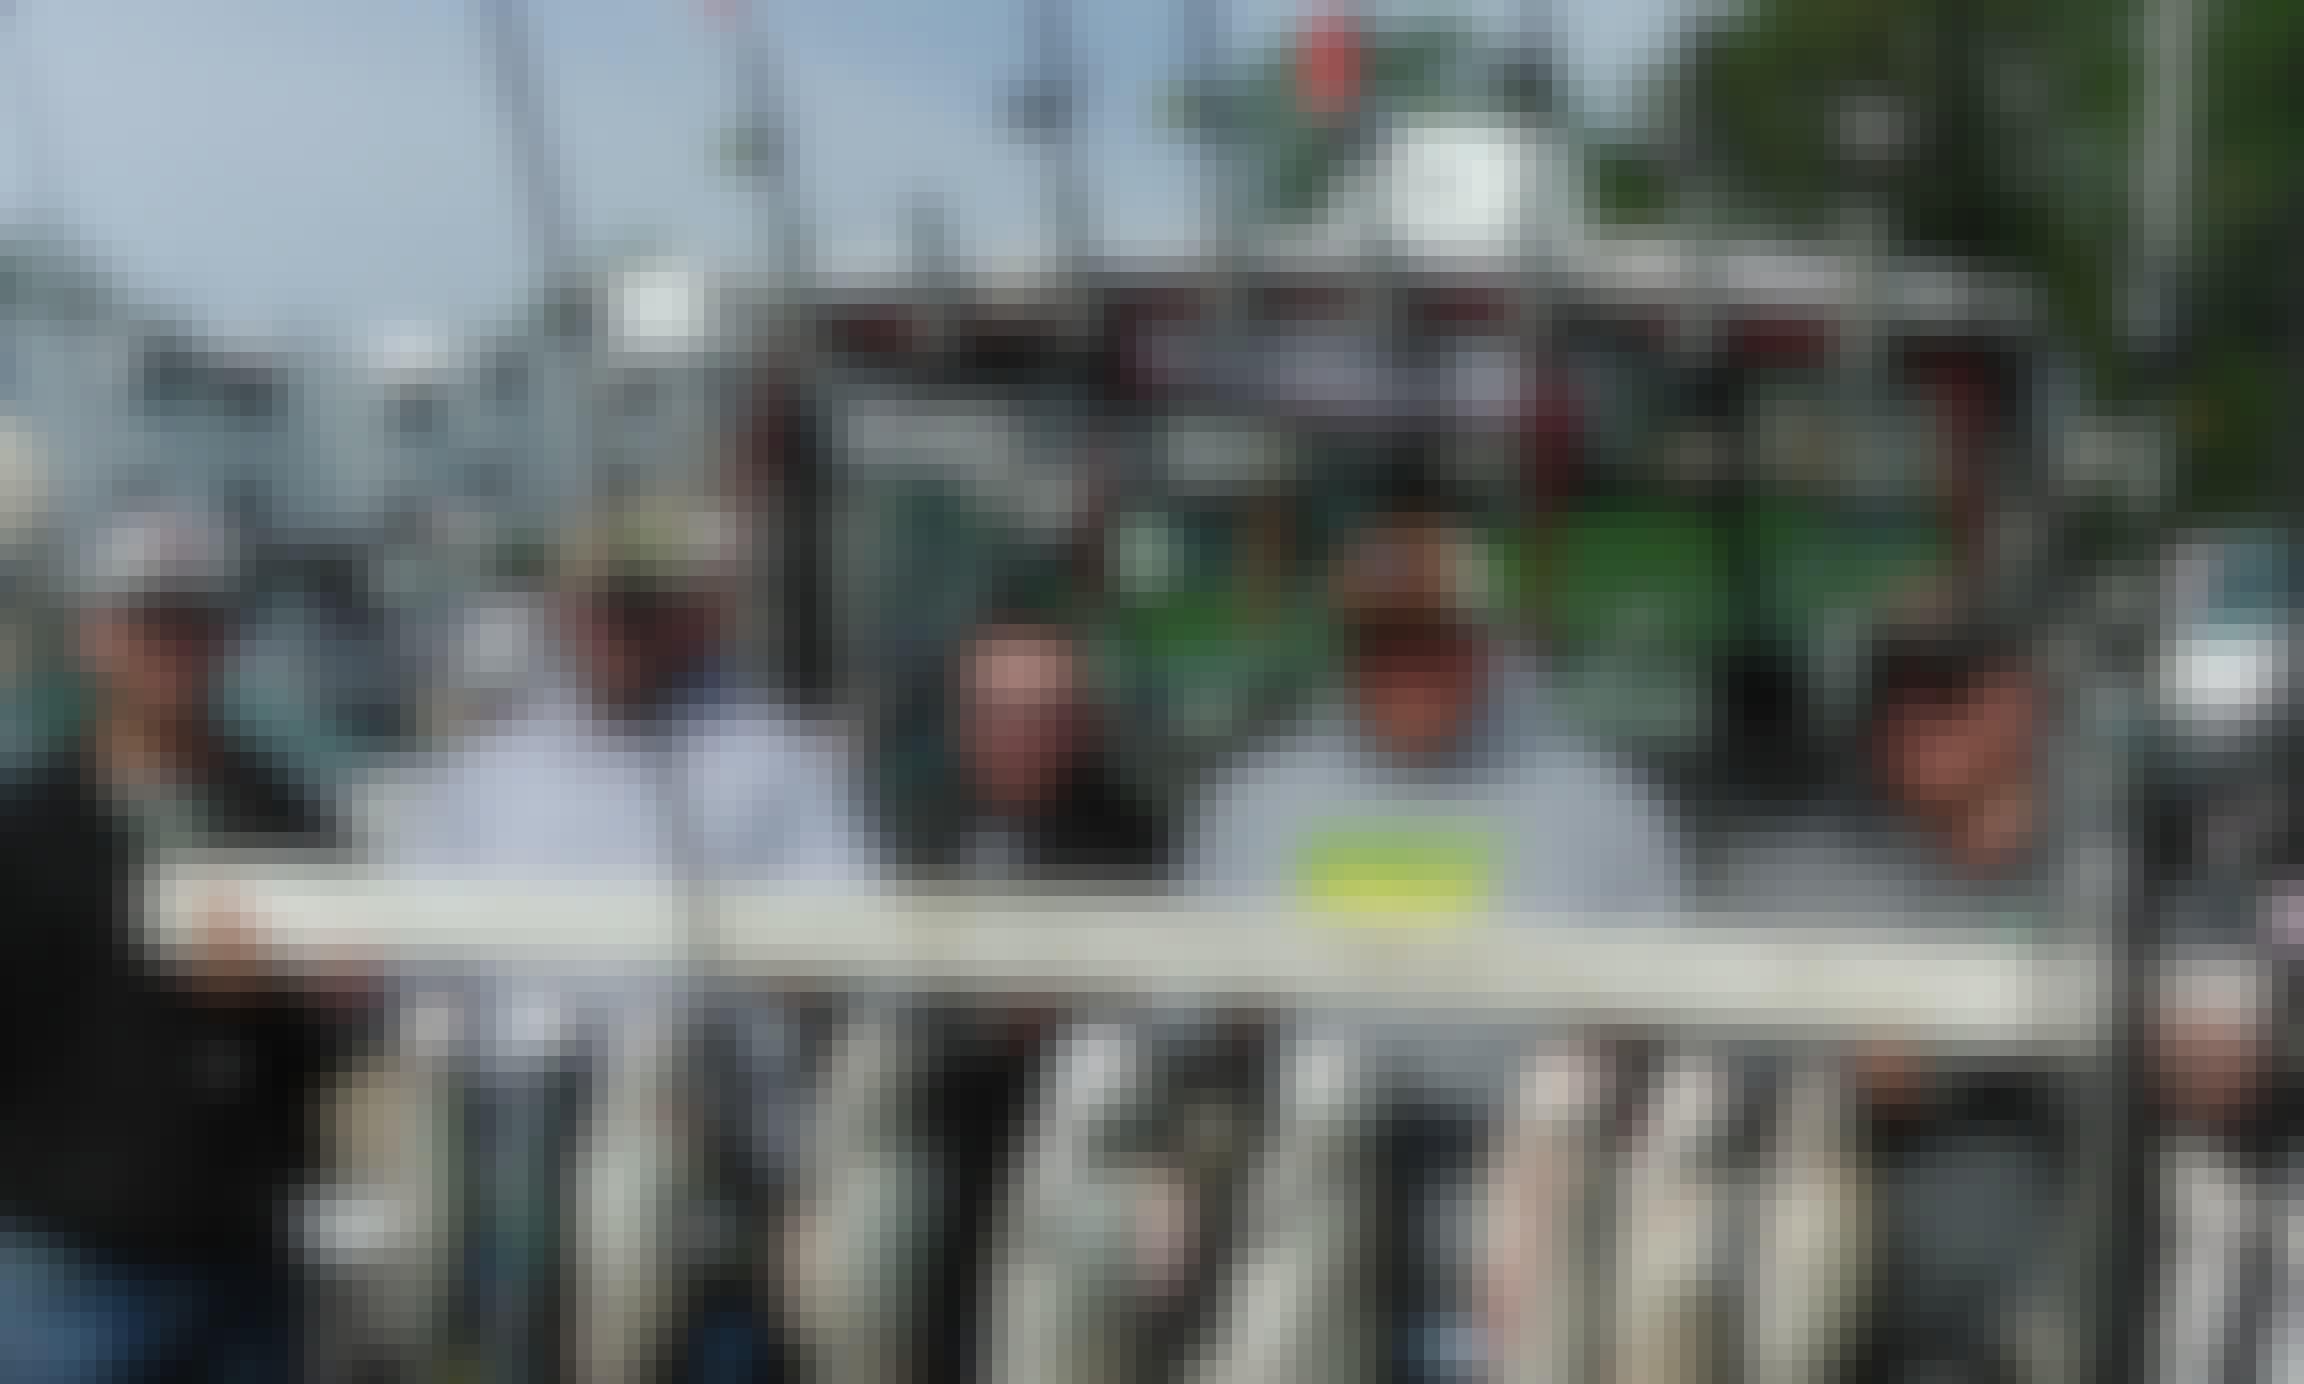 Fishing Charter for 6 Person in Kenosha, Wisconsin